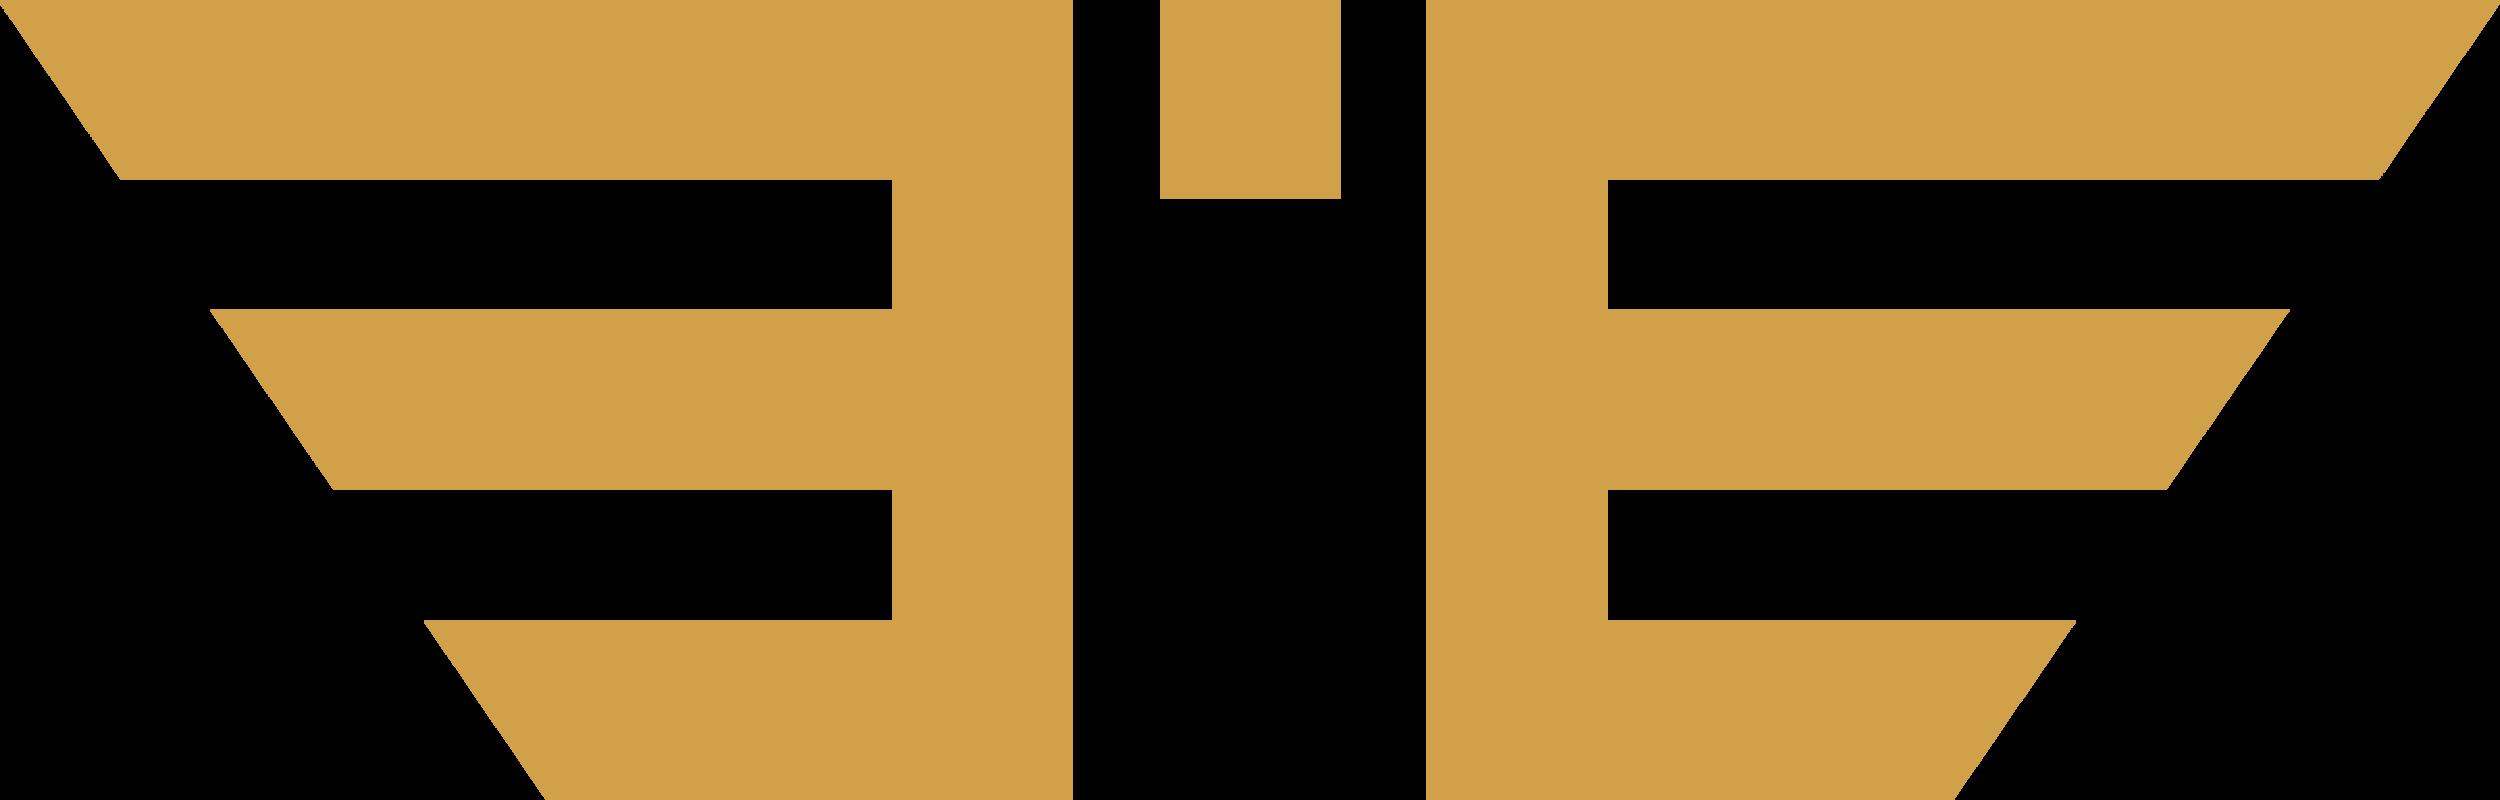 Echelon_symbol_guld.png